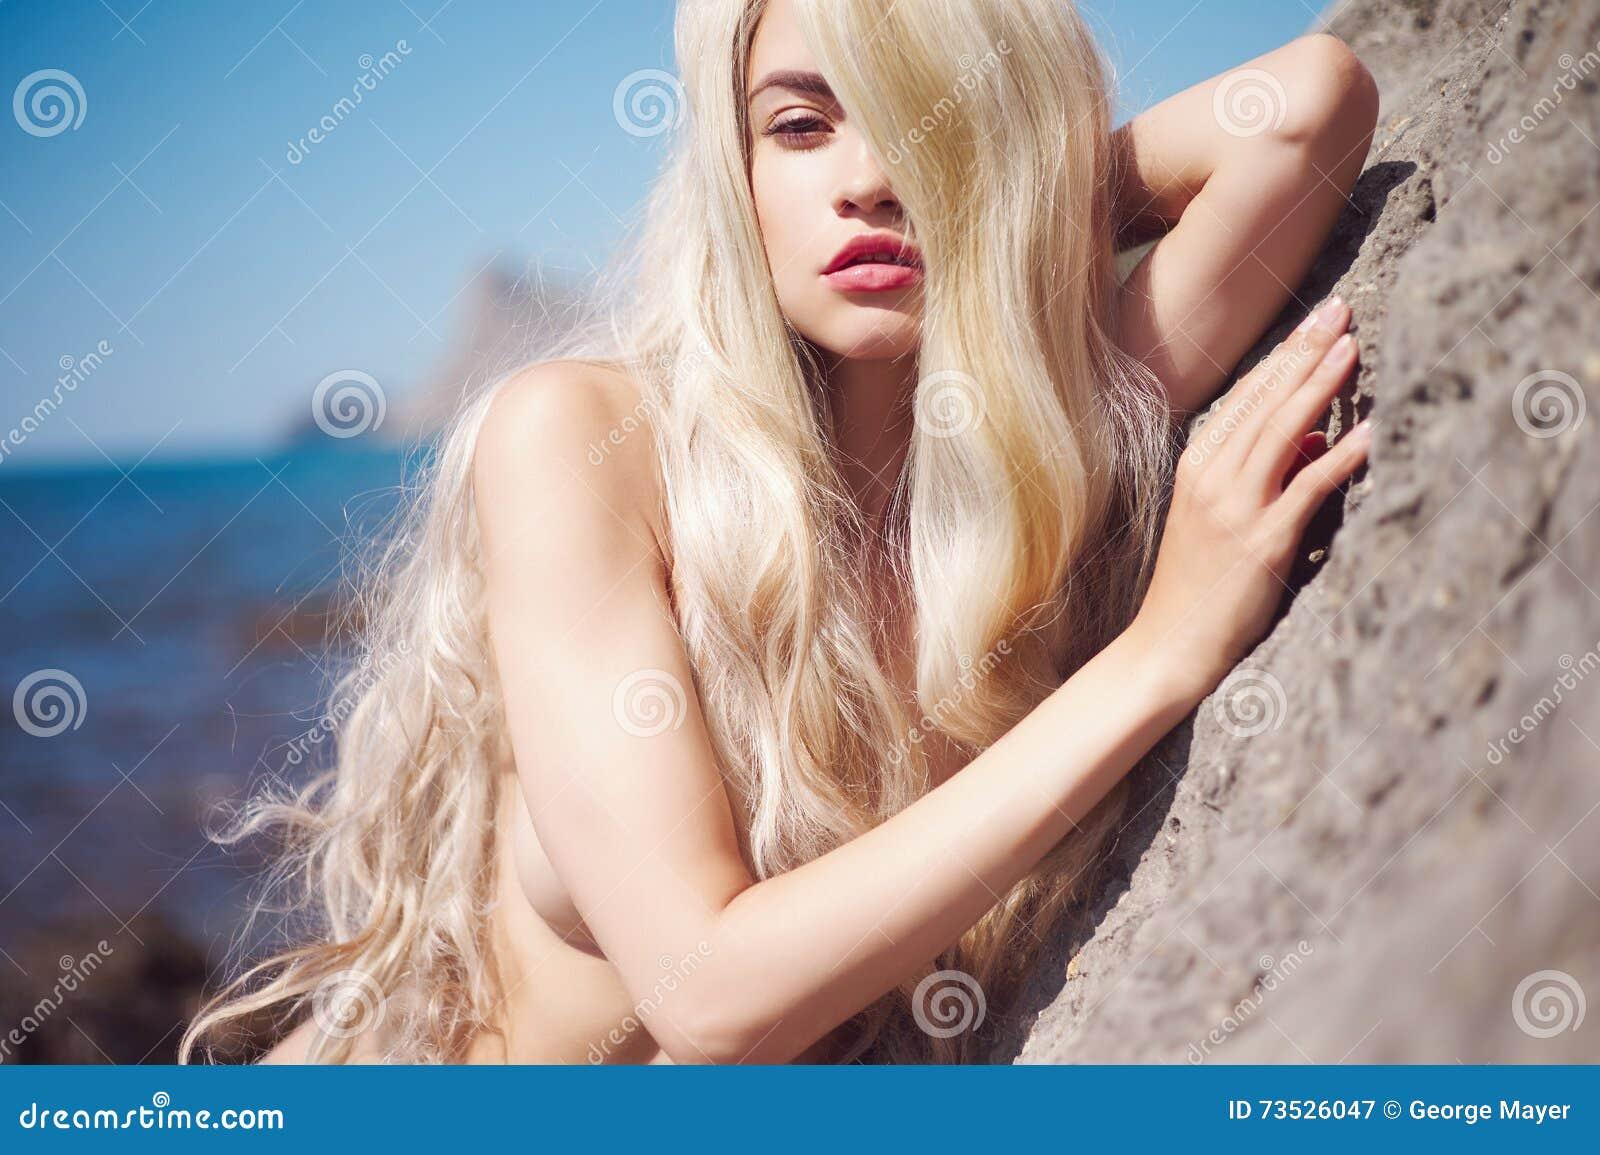 Hot asian girl nud